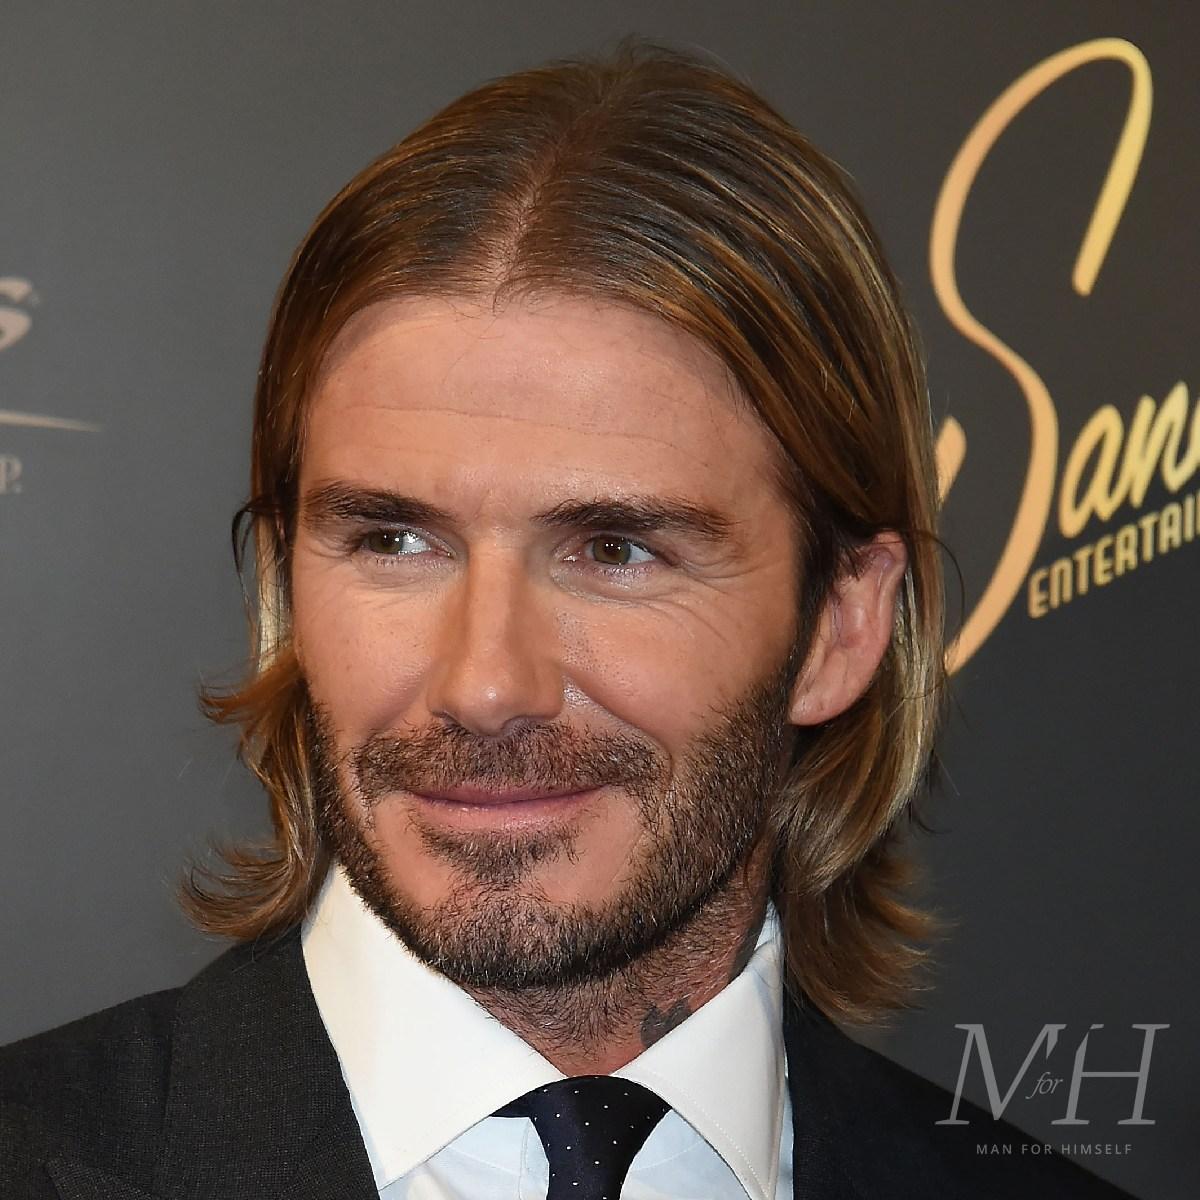 david-beckham-medium-length-hairstyle-1200-GettyImages-857409034